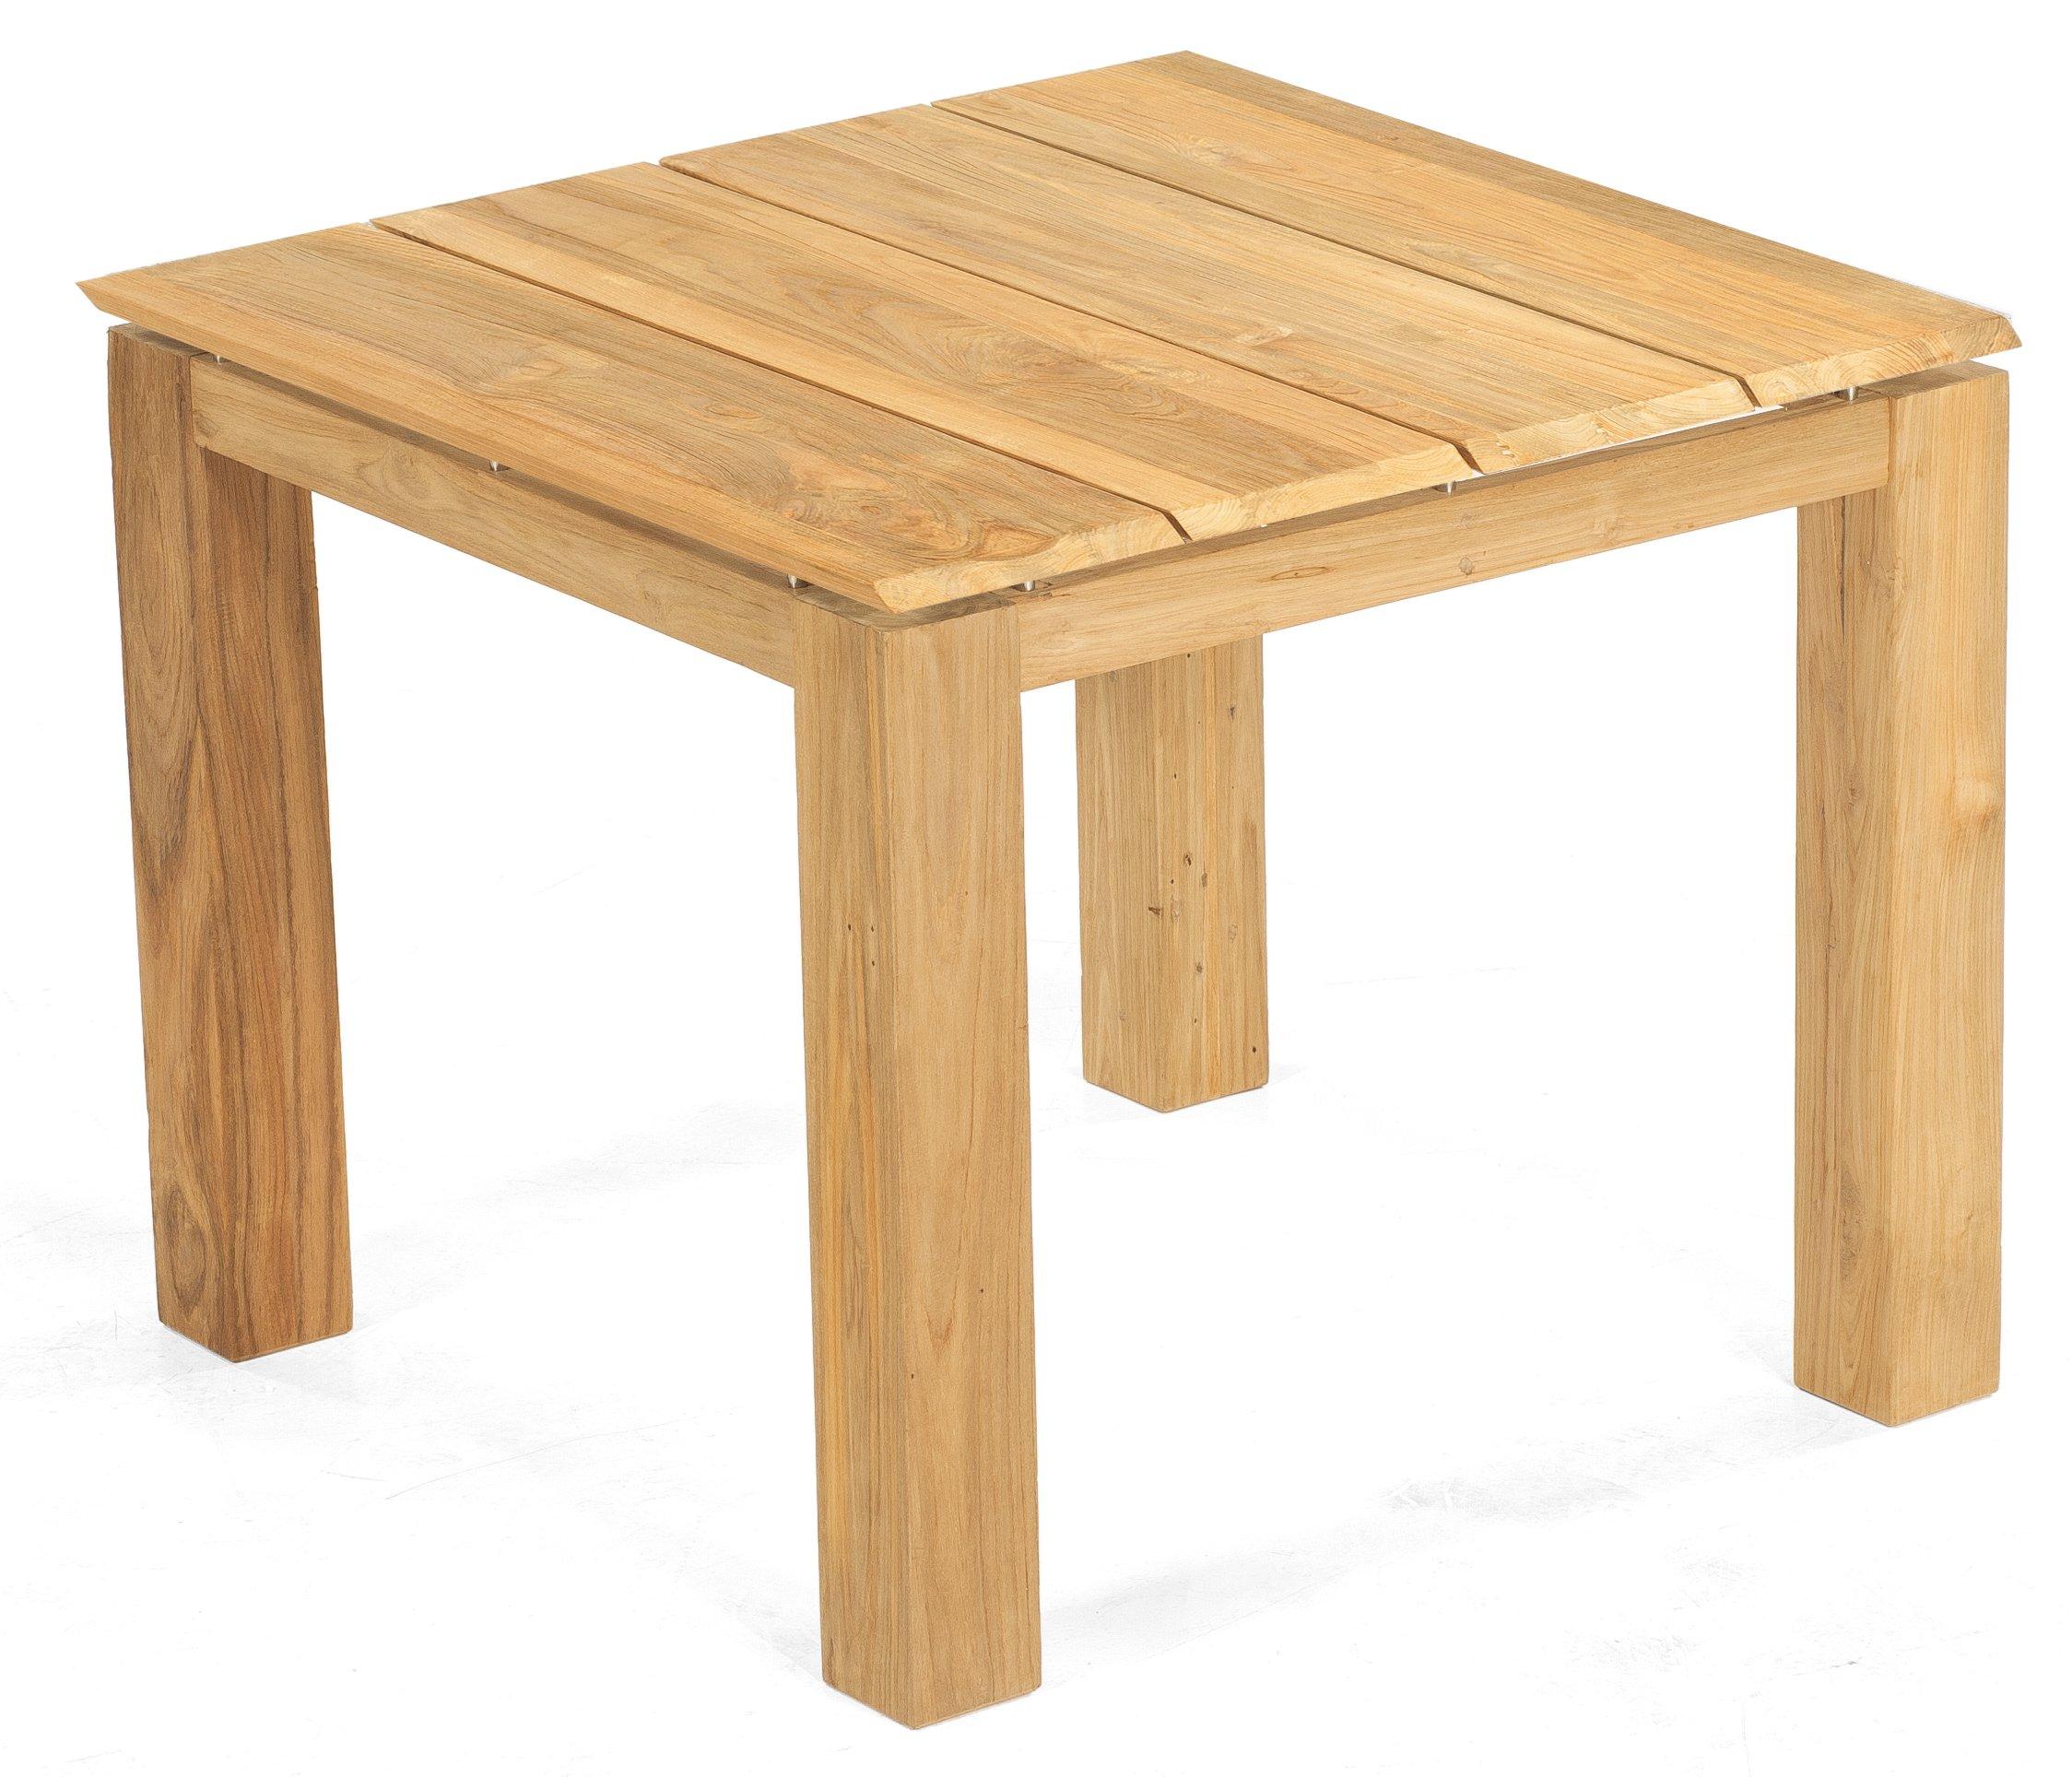 Quadratischer Massivholz Gartentisch 90 X 90 Cm Massiv Teak Tischplatte